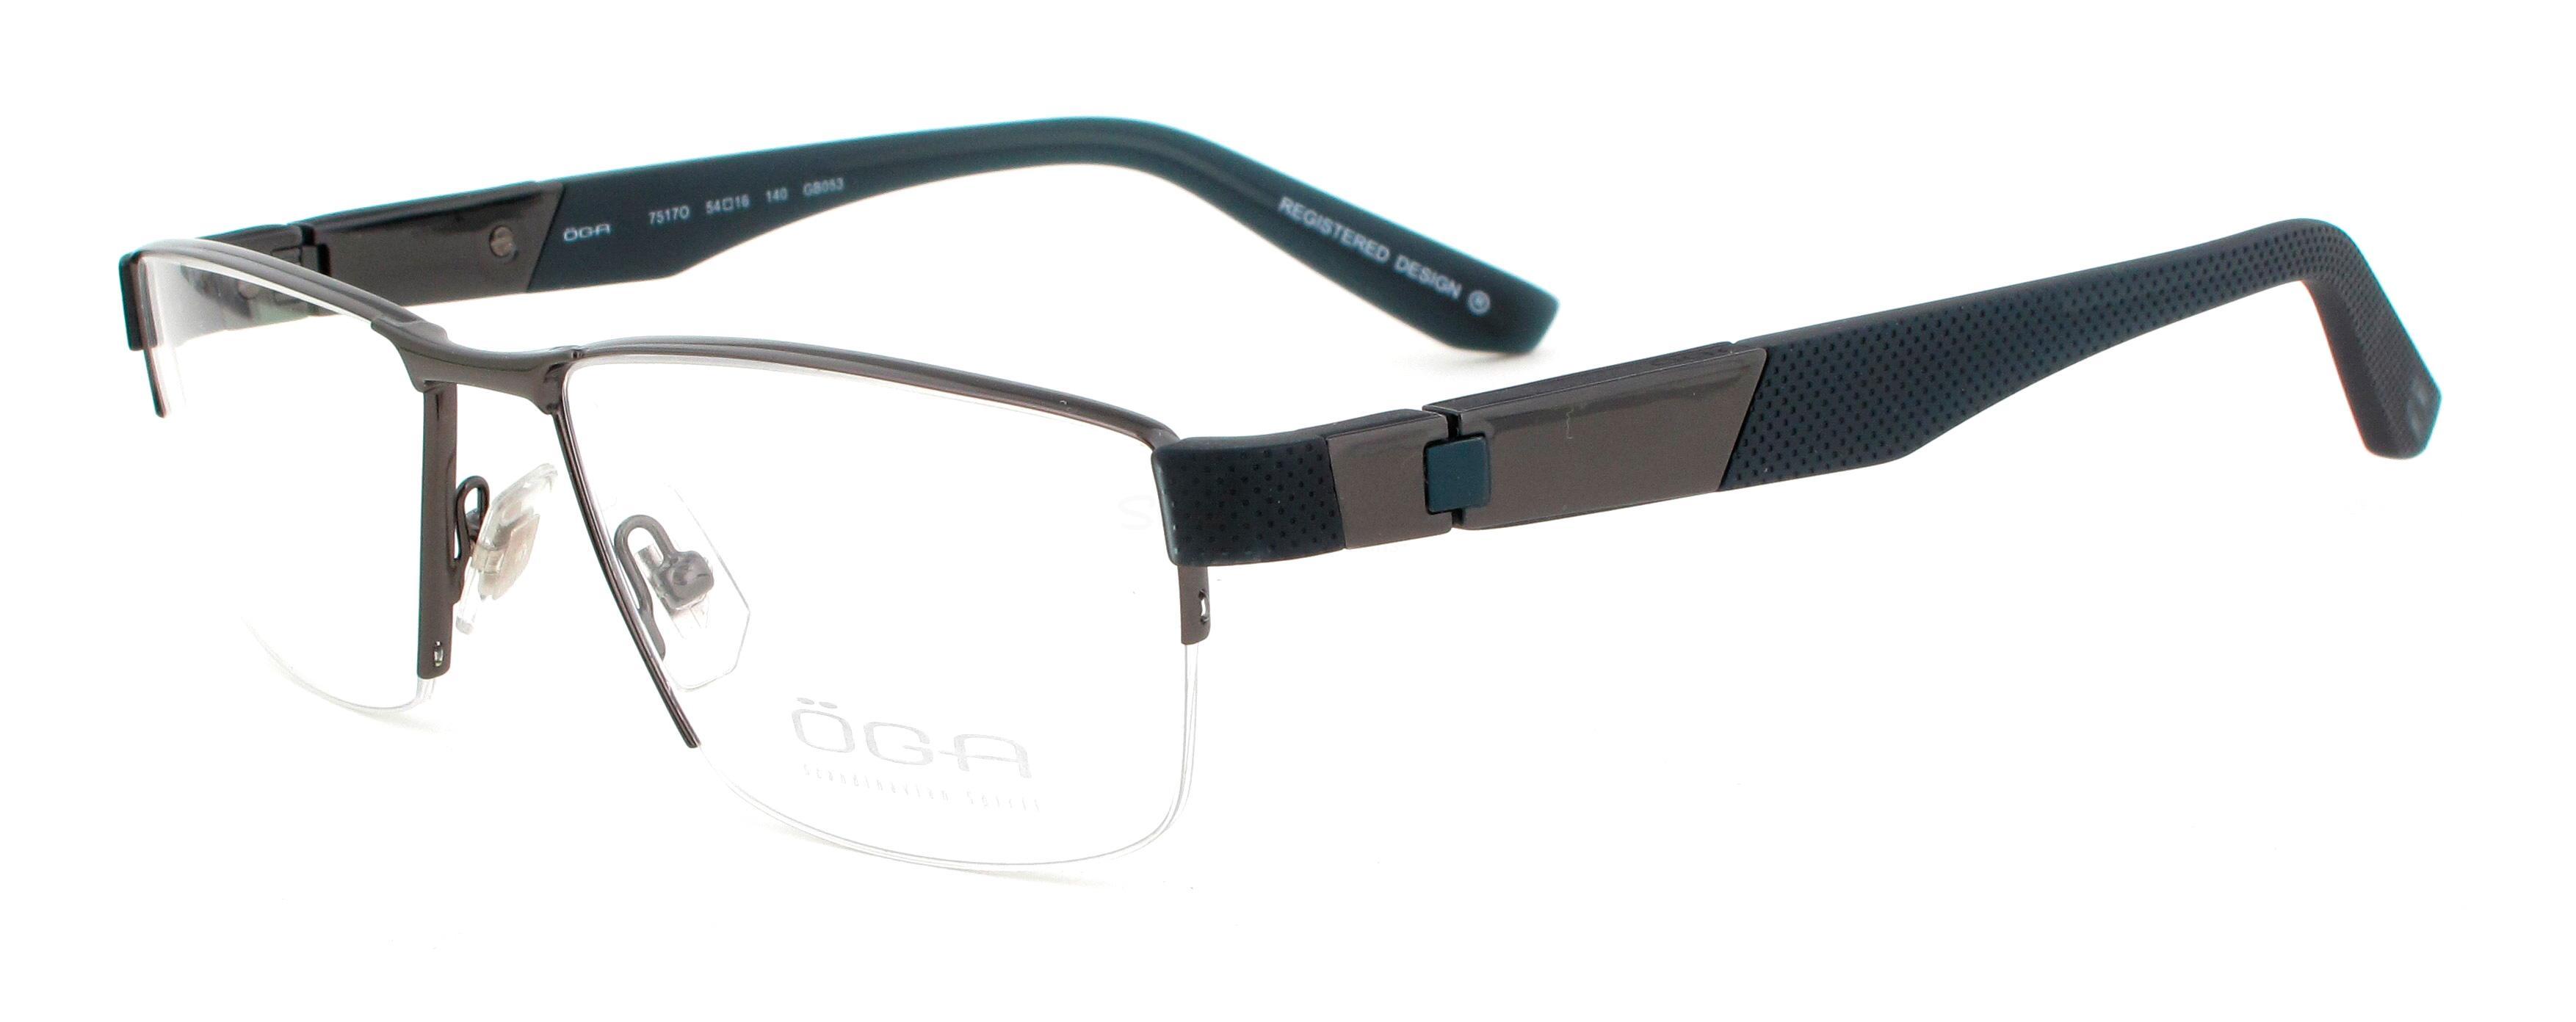 GB053 7517O FALK 3 Glasses, ÖGA Scandinavian Spirit